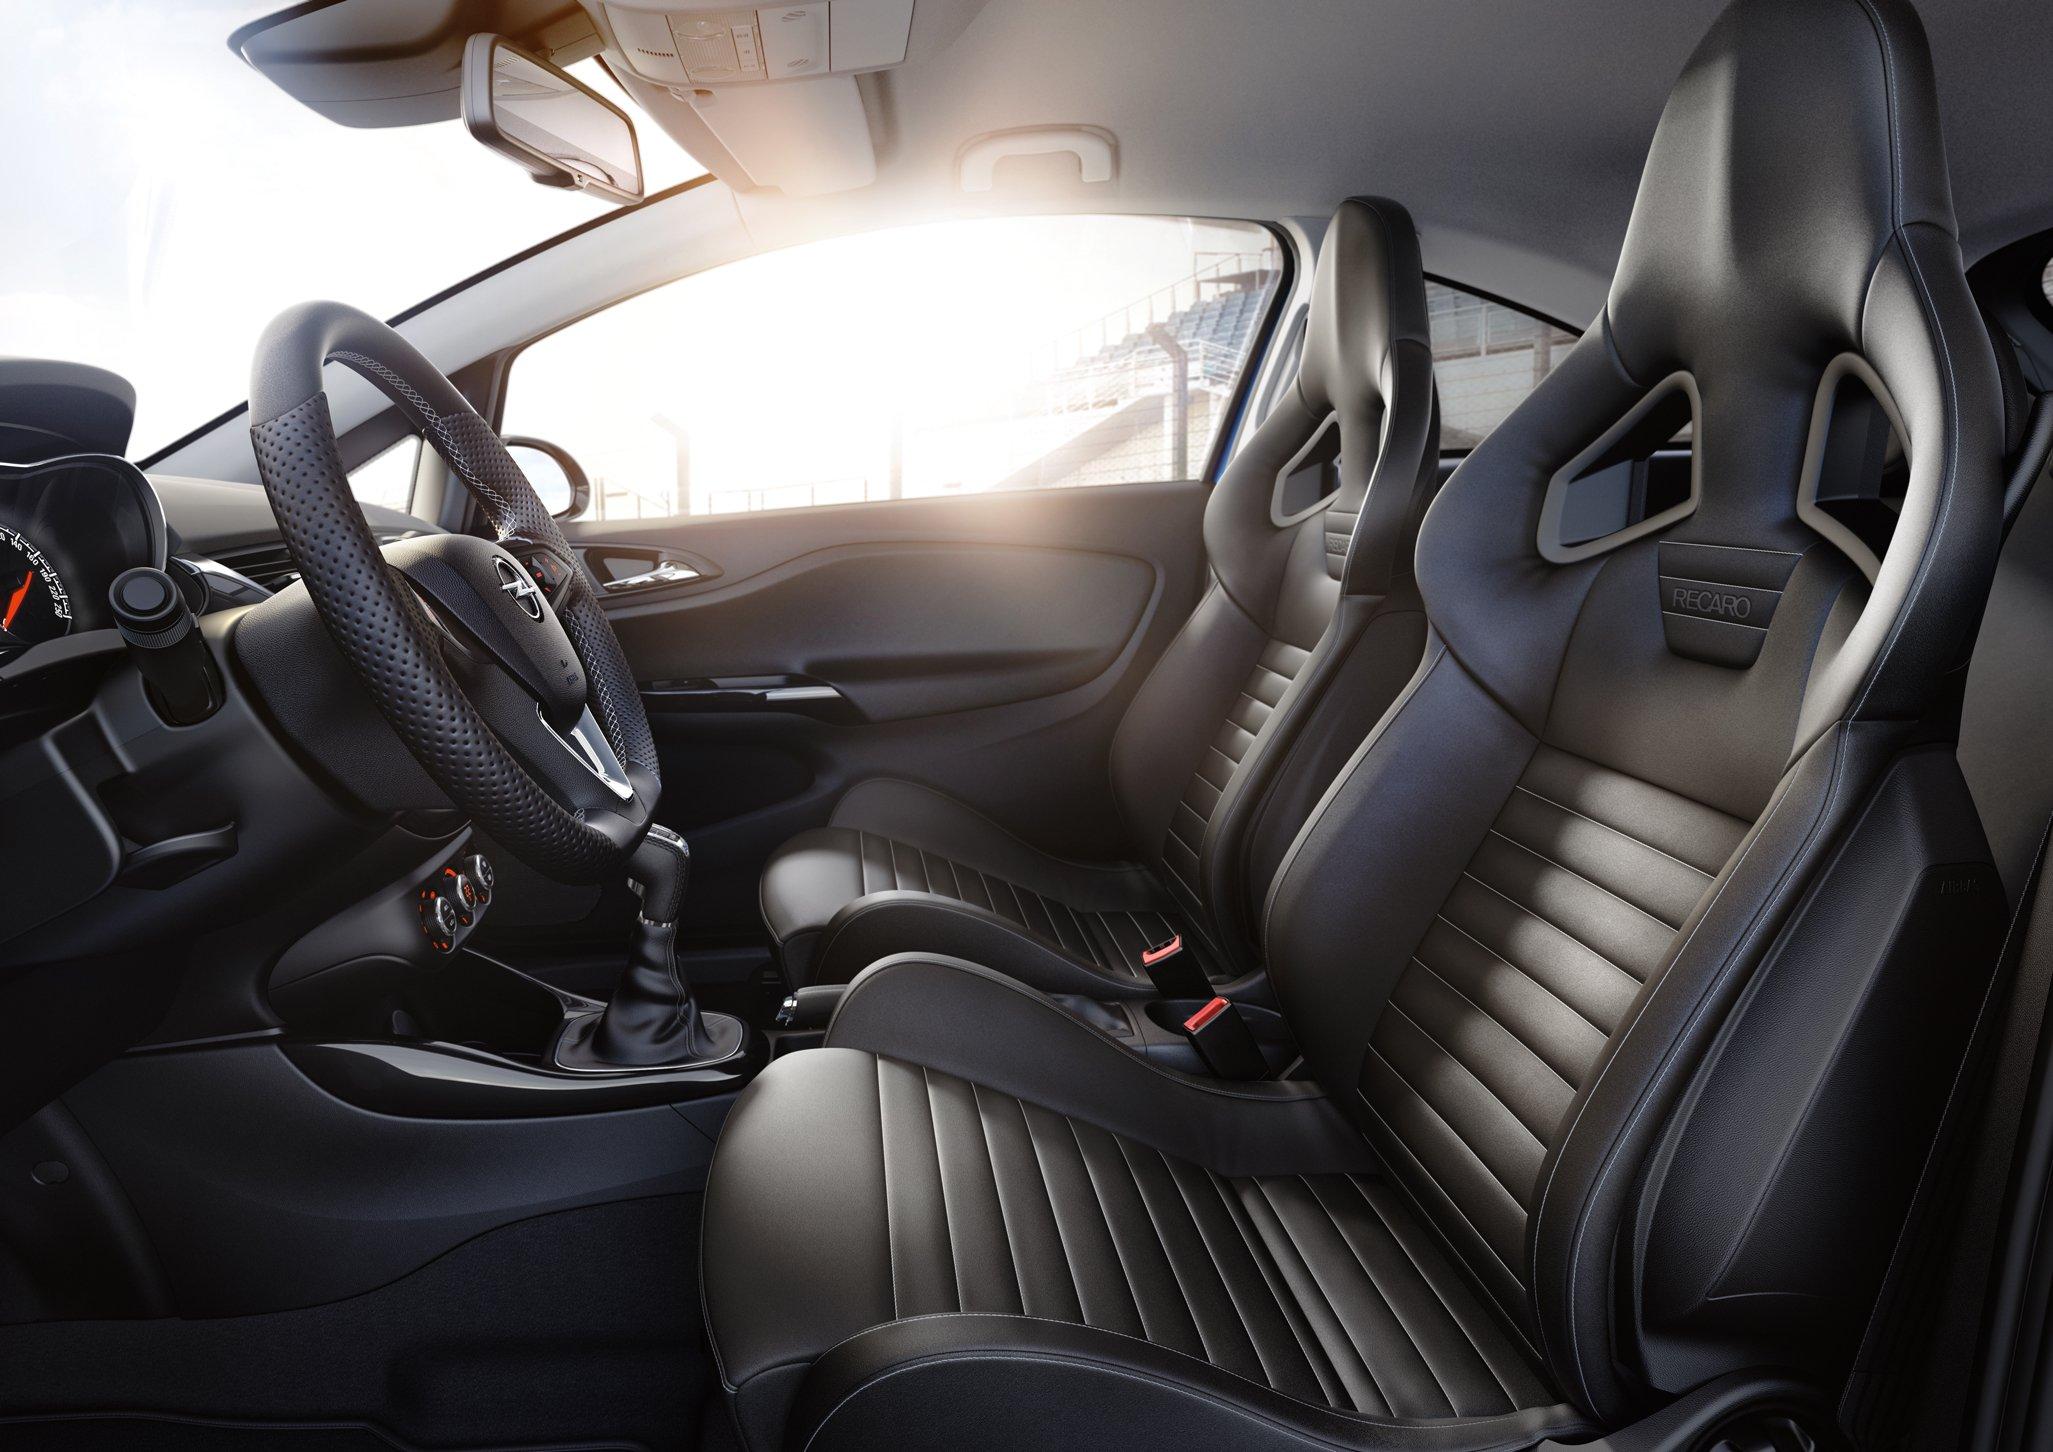 https://onemorelap.com/wp-content/uploads/2017/01/Opel-Corsa-OPC-Interior-292990.jpg